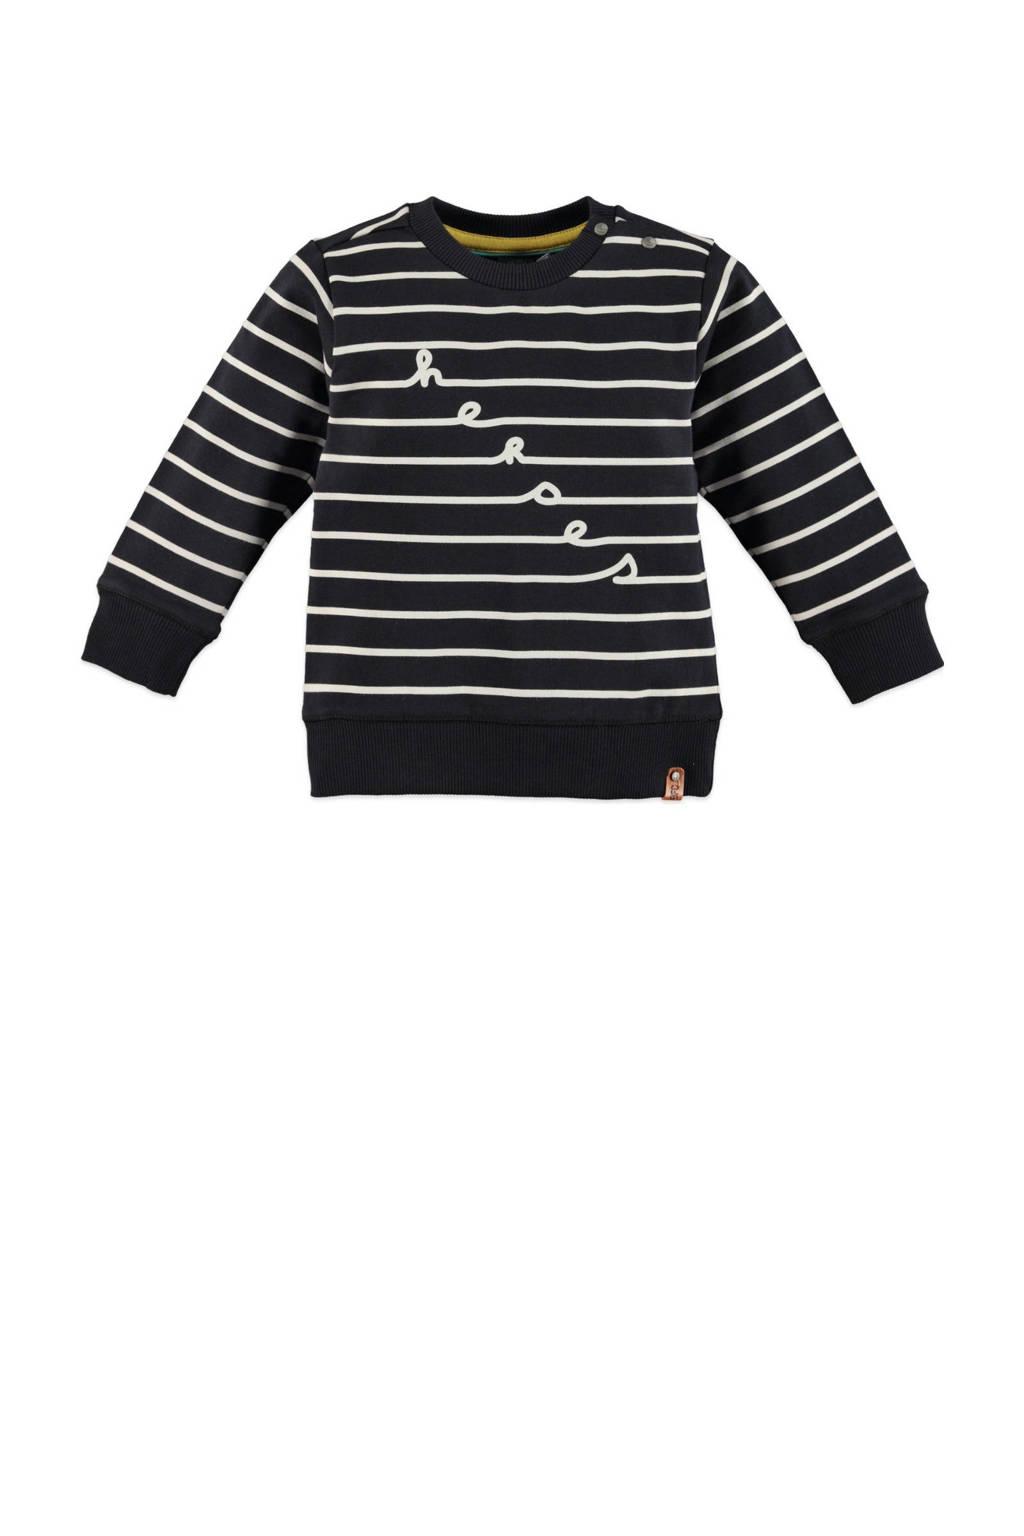 Babyface gestreepte sweater donkerblauw/wit, Donkerblauw/wit